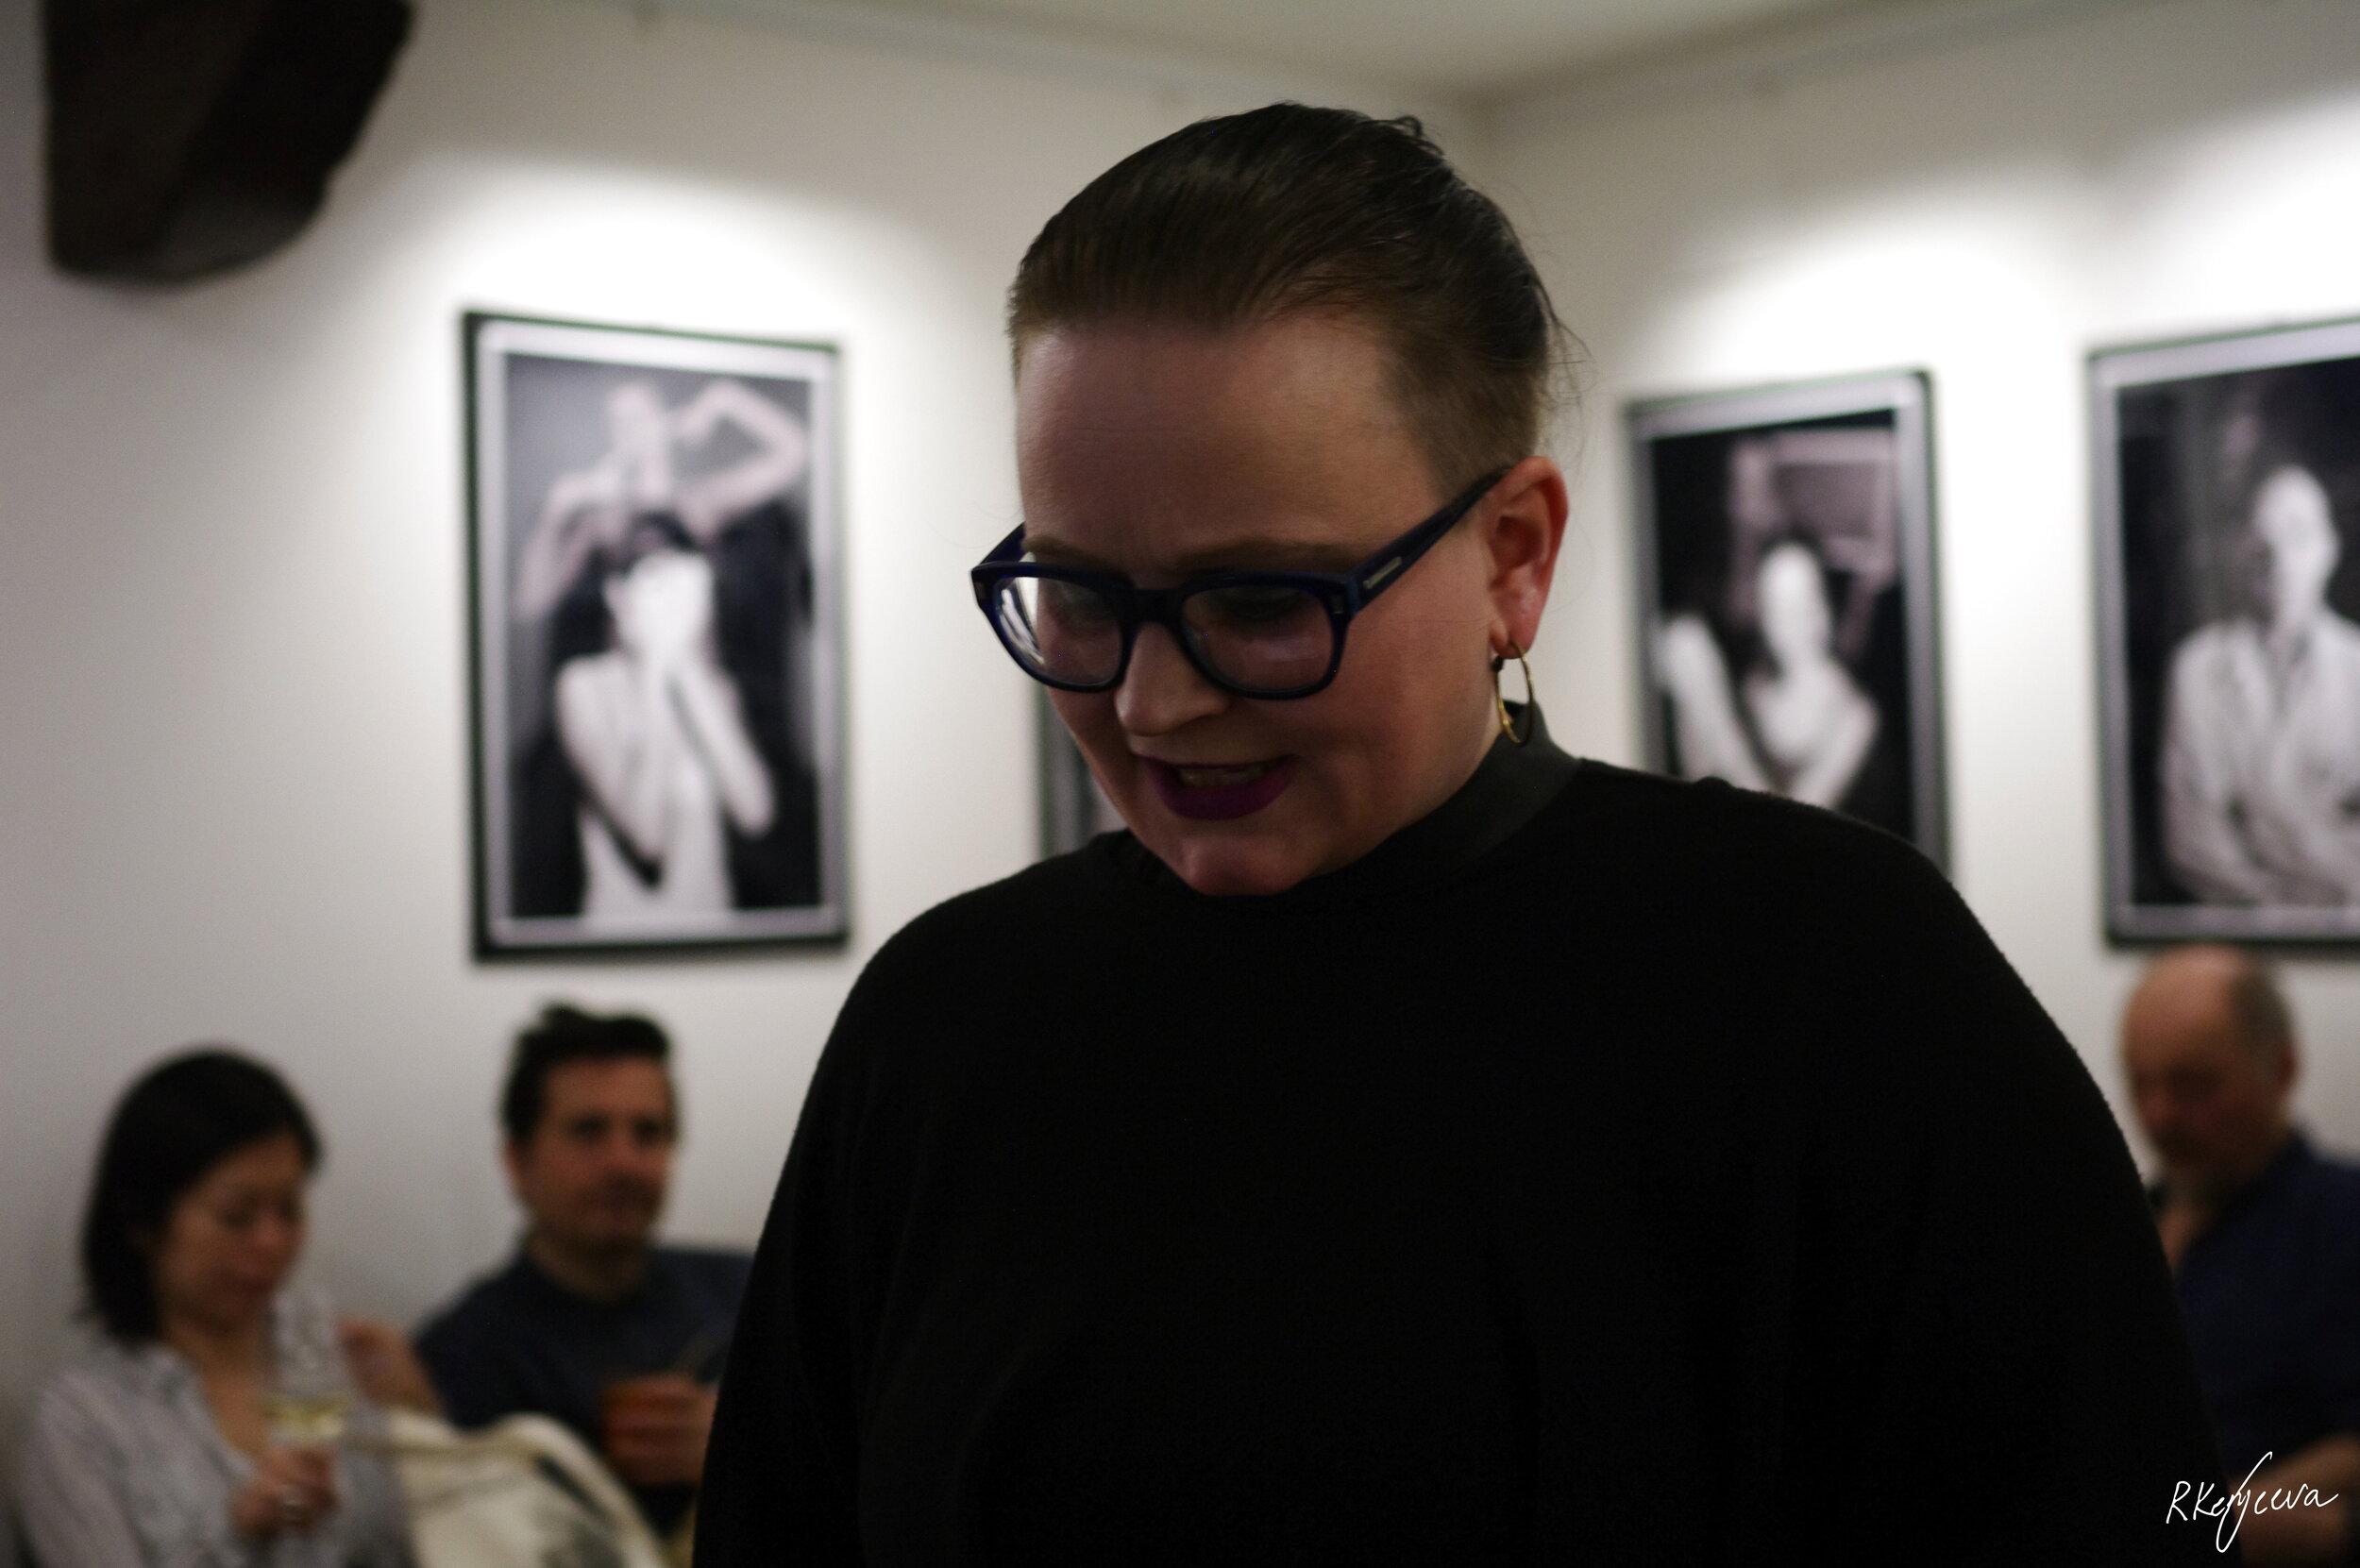 Marita Isobel Solberg performance at Imagina Cafe, Venize